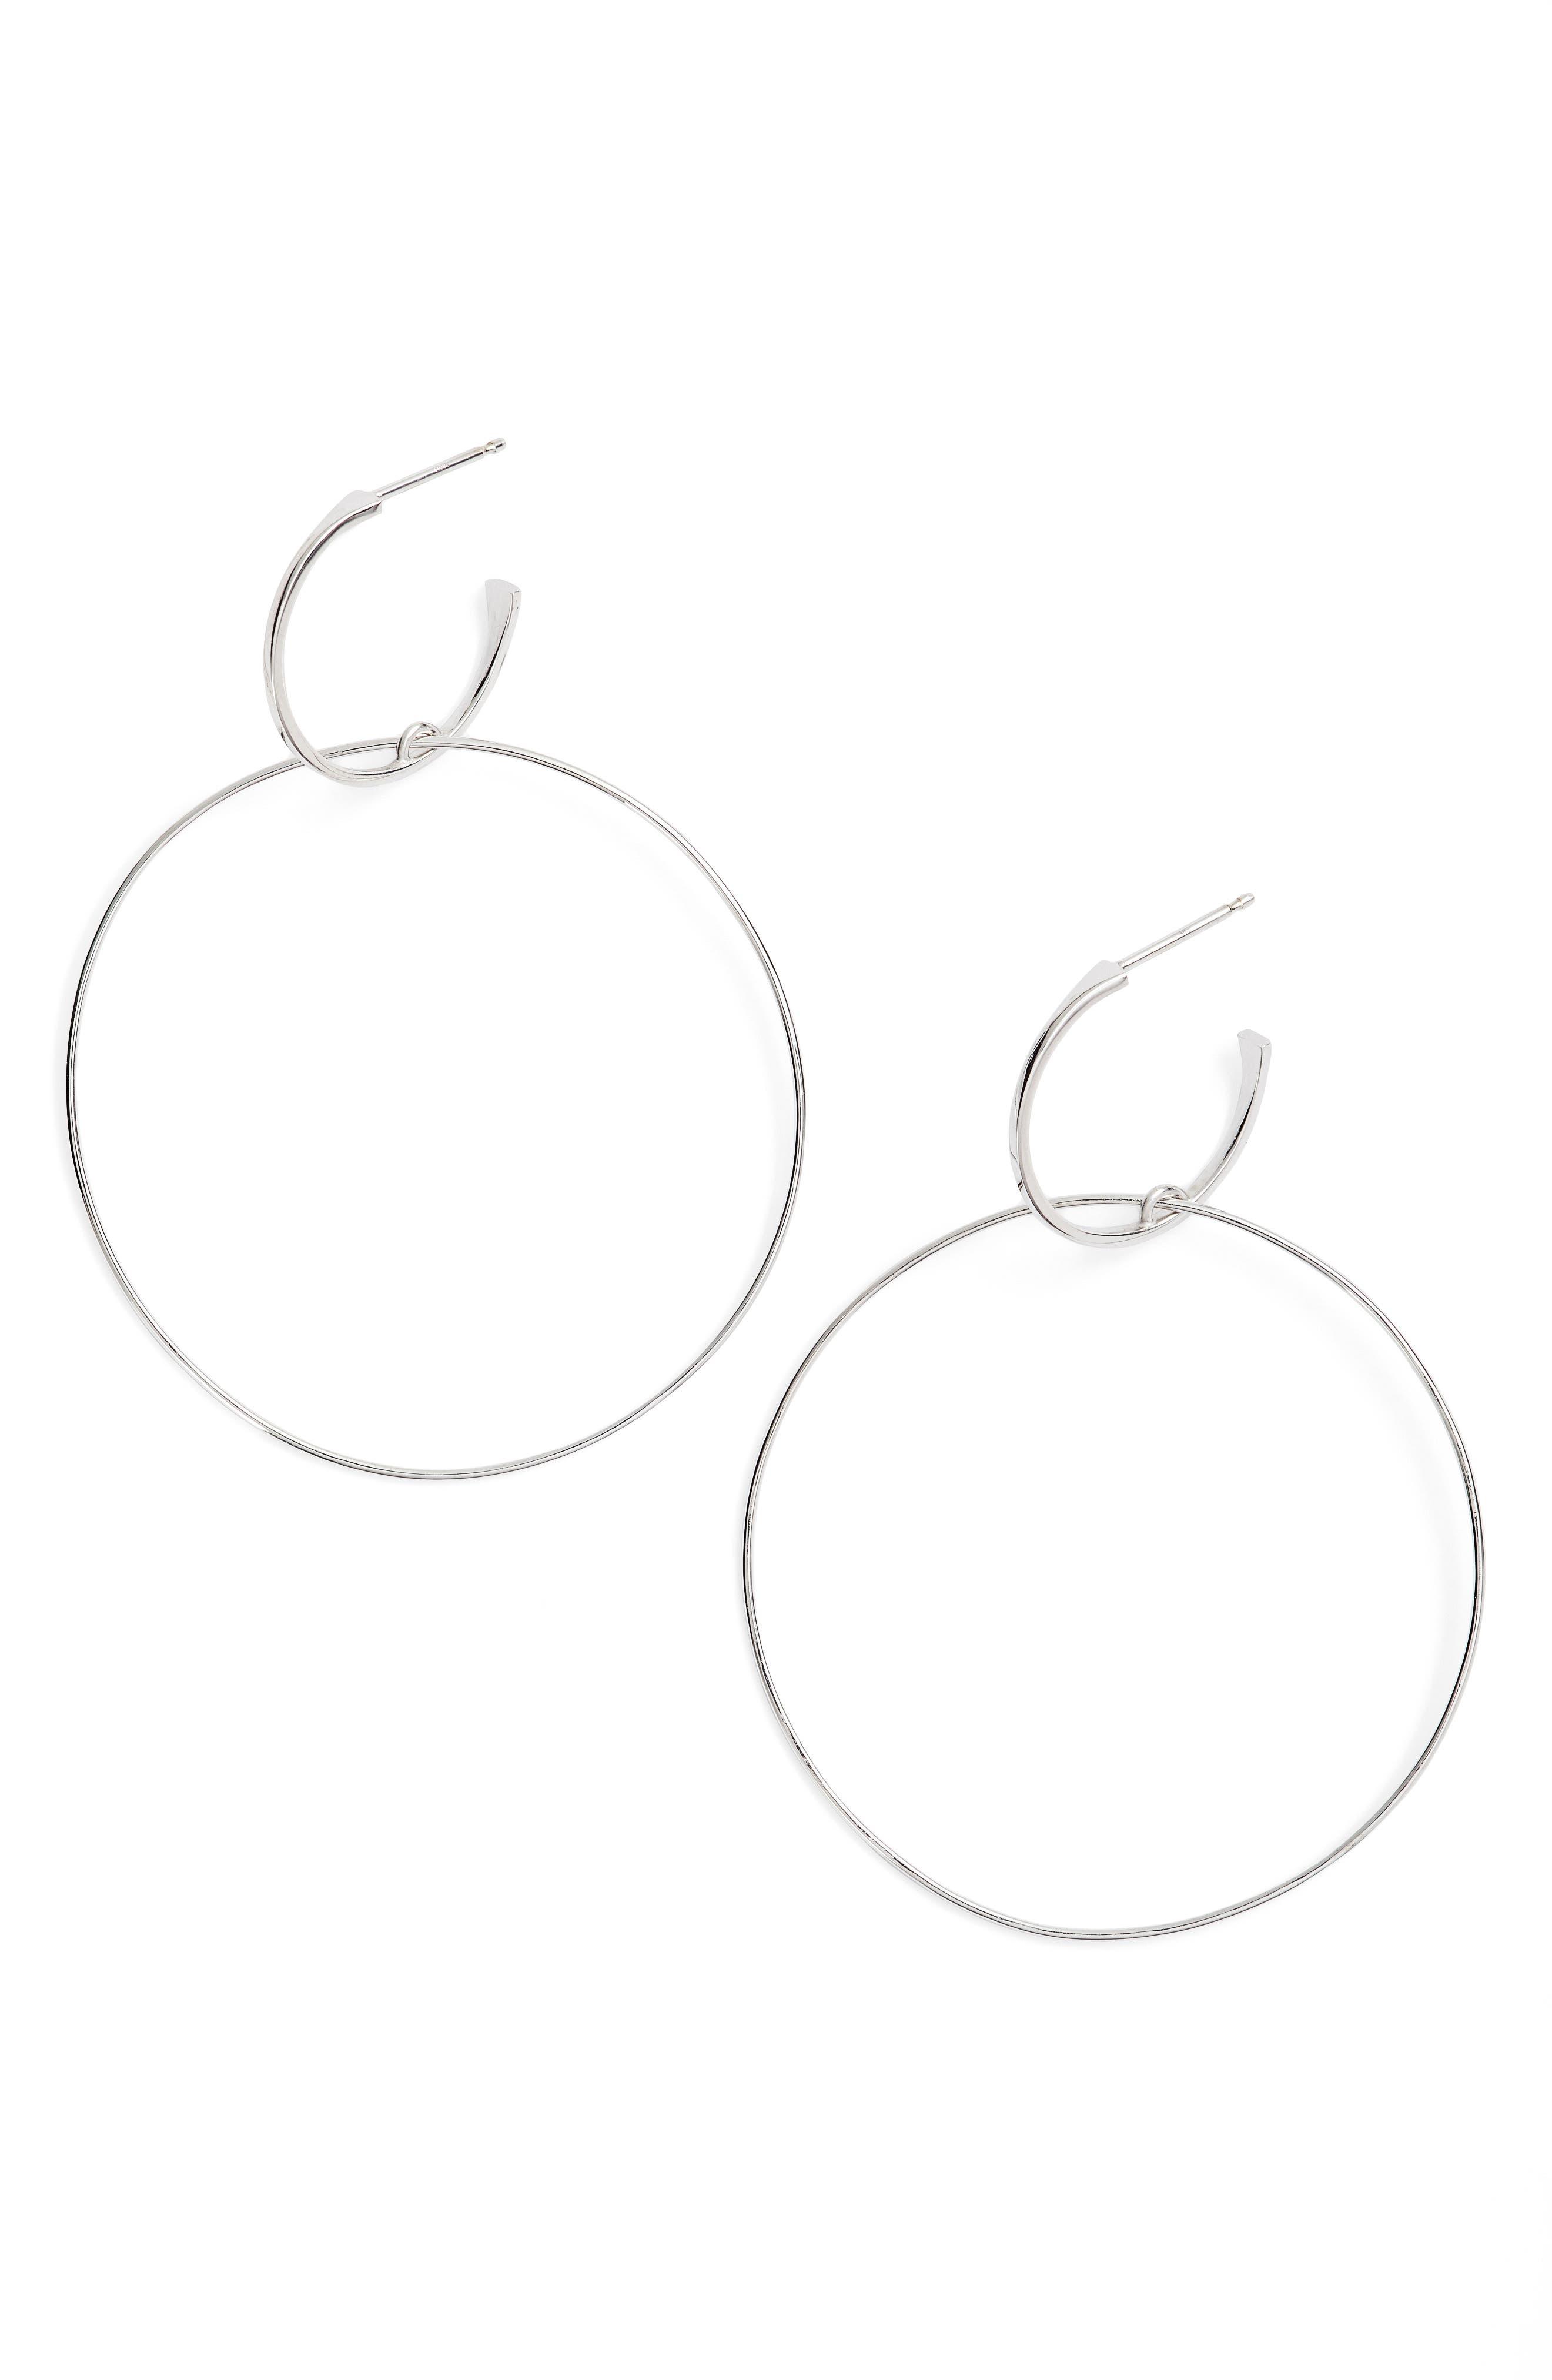 Main Image - Lana Jewelry Bond Small Double Hoop Earrings